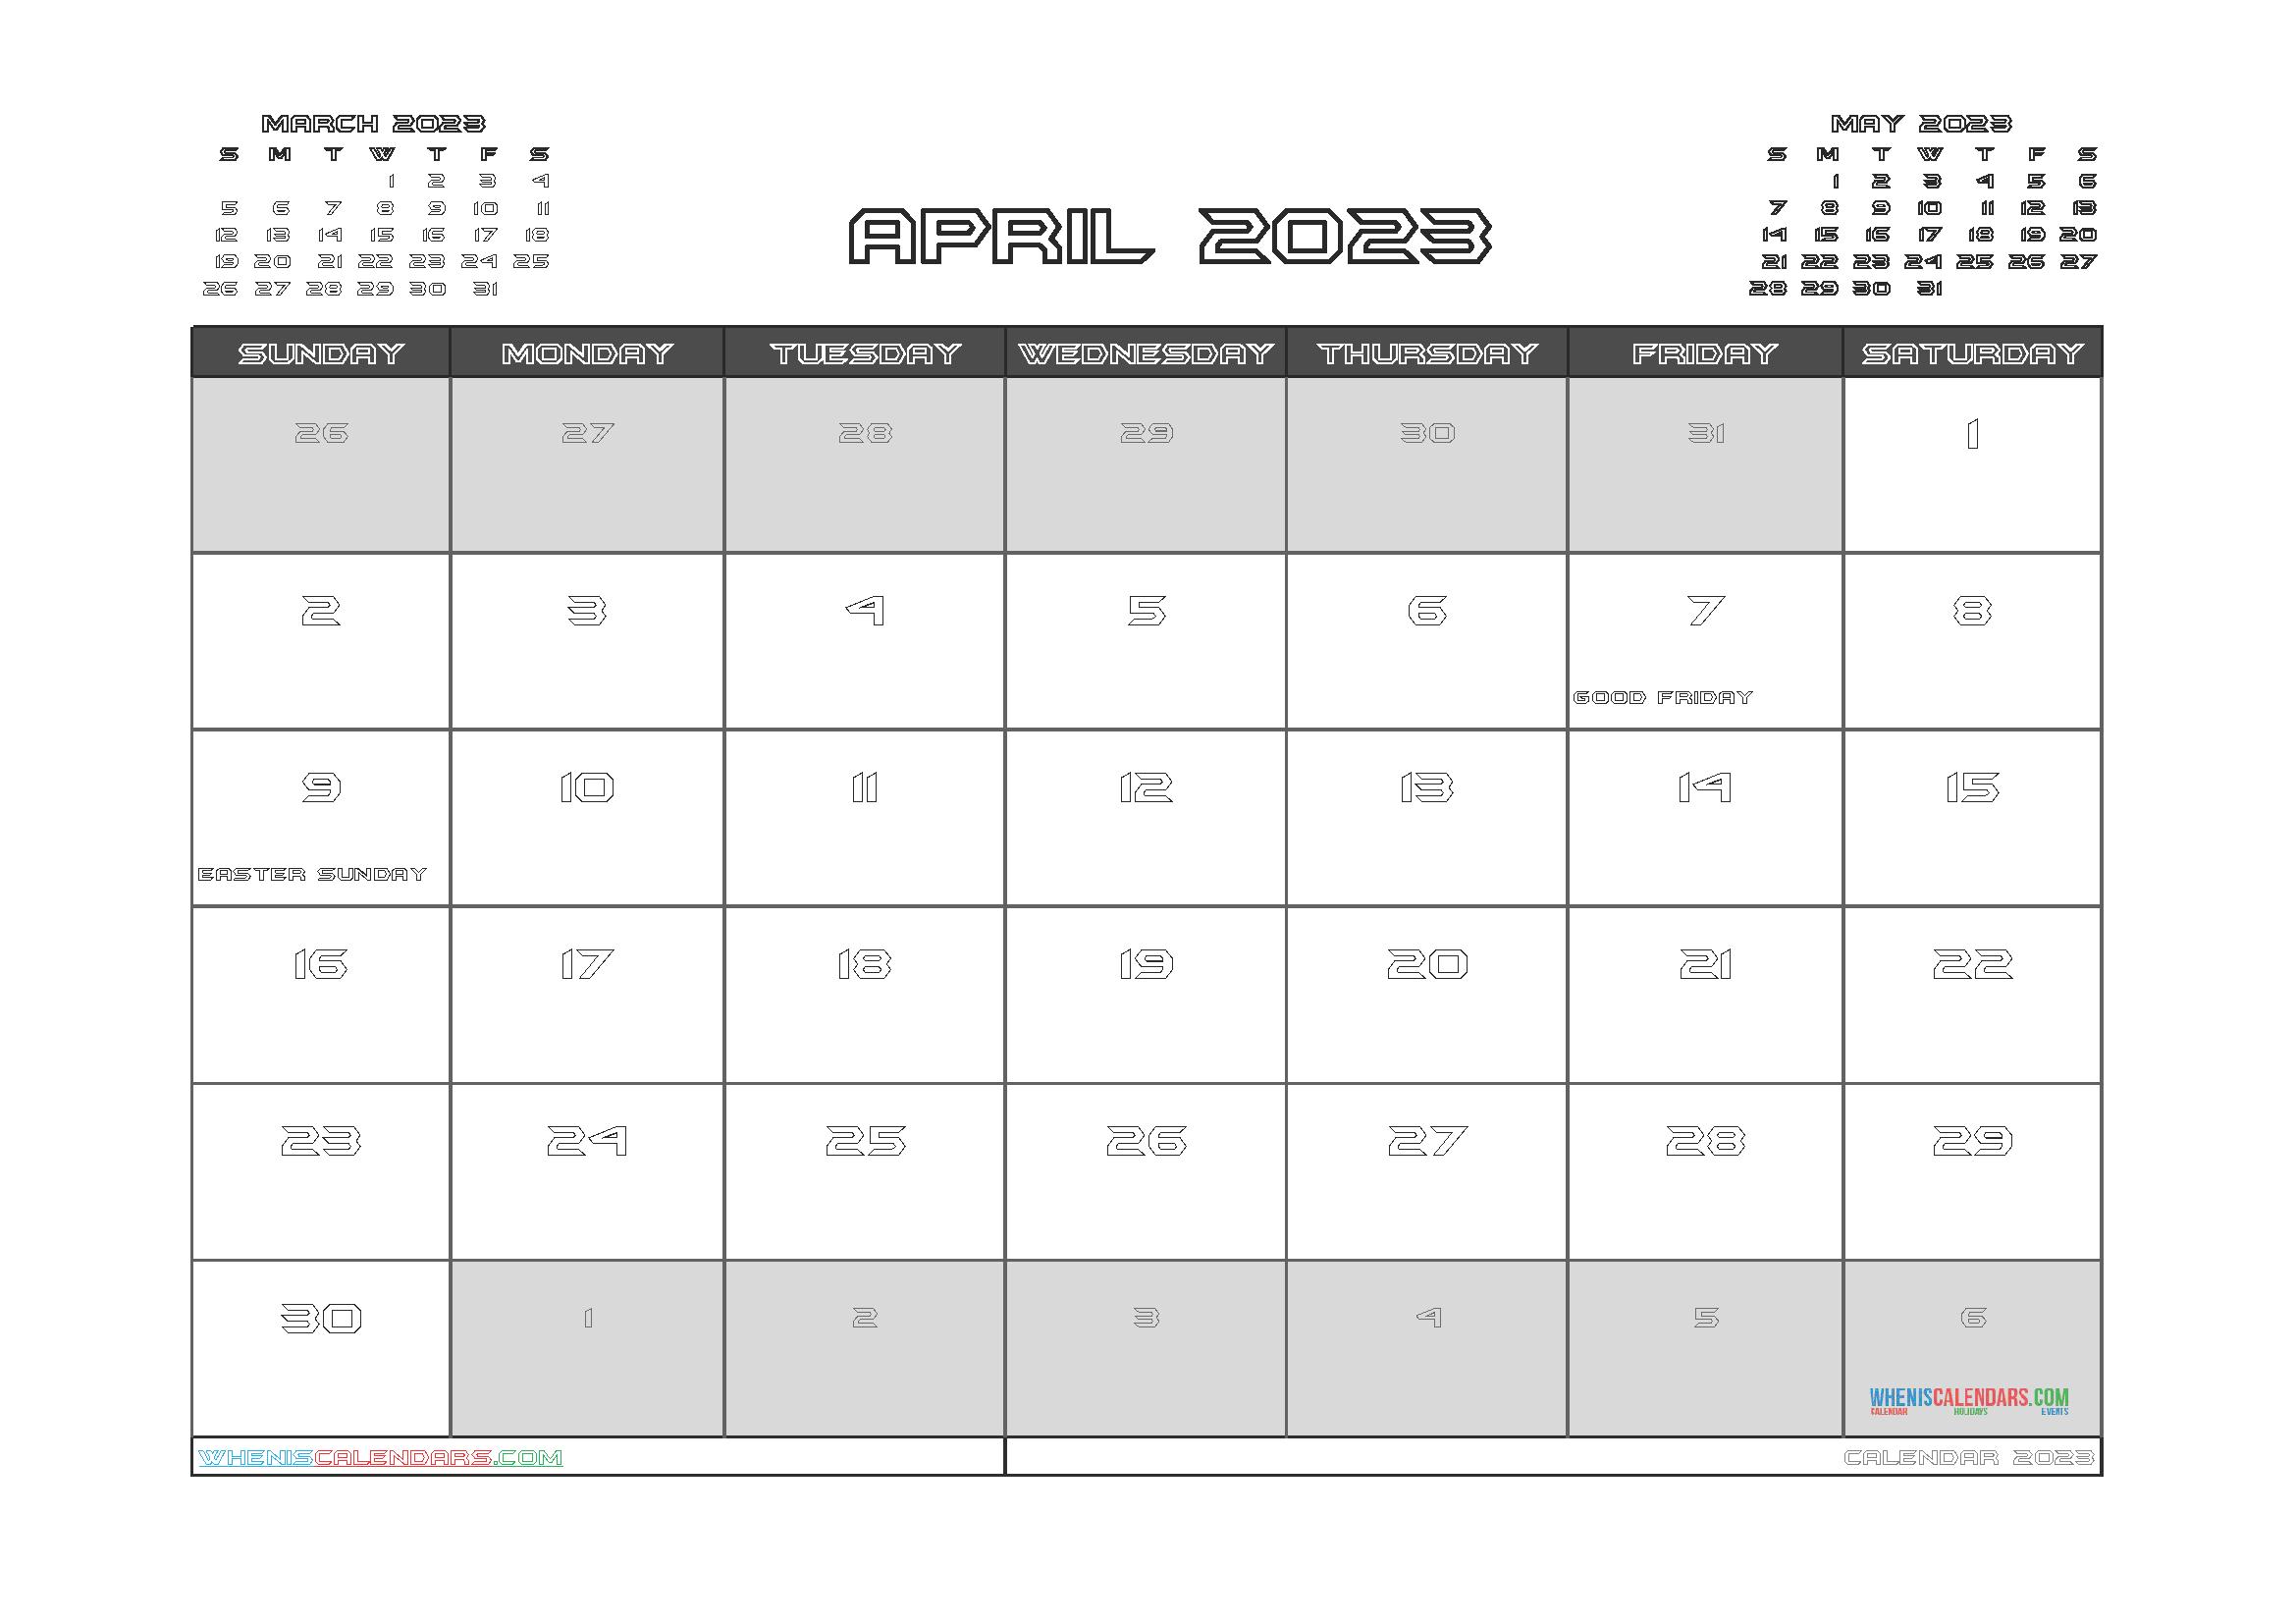 Free Editable Calendar April 2023 PDF